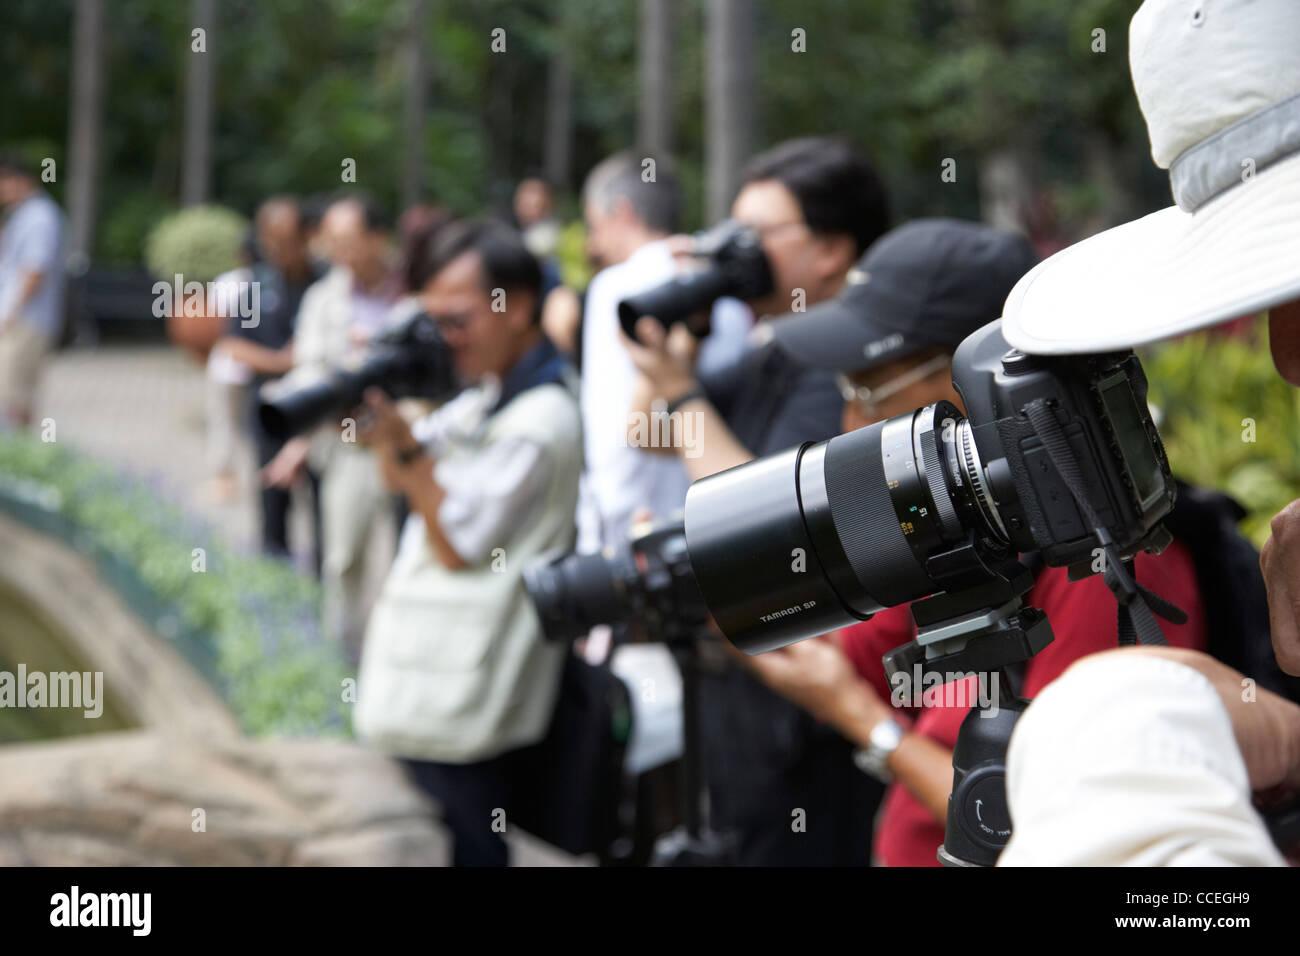 Fila di fotografi cinesi utilizzando teleobiettivi di hong kong park central RAS di Hong kong cina asia Immagini Stock